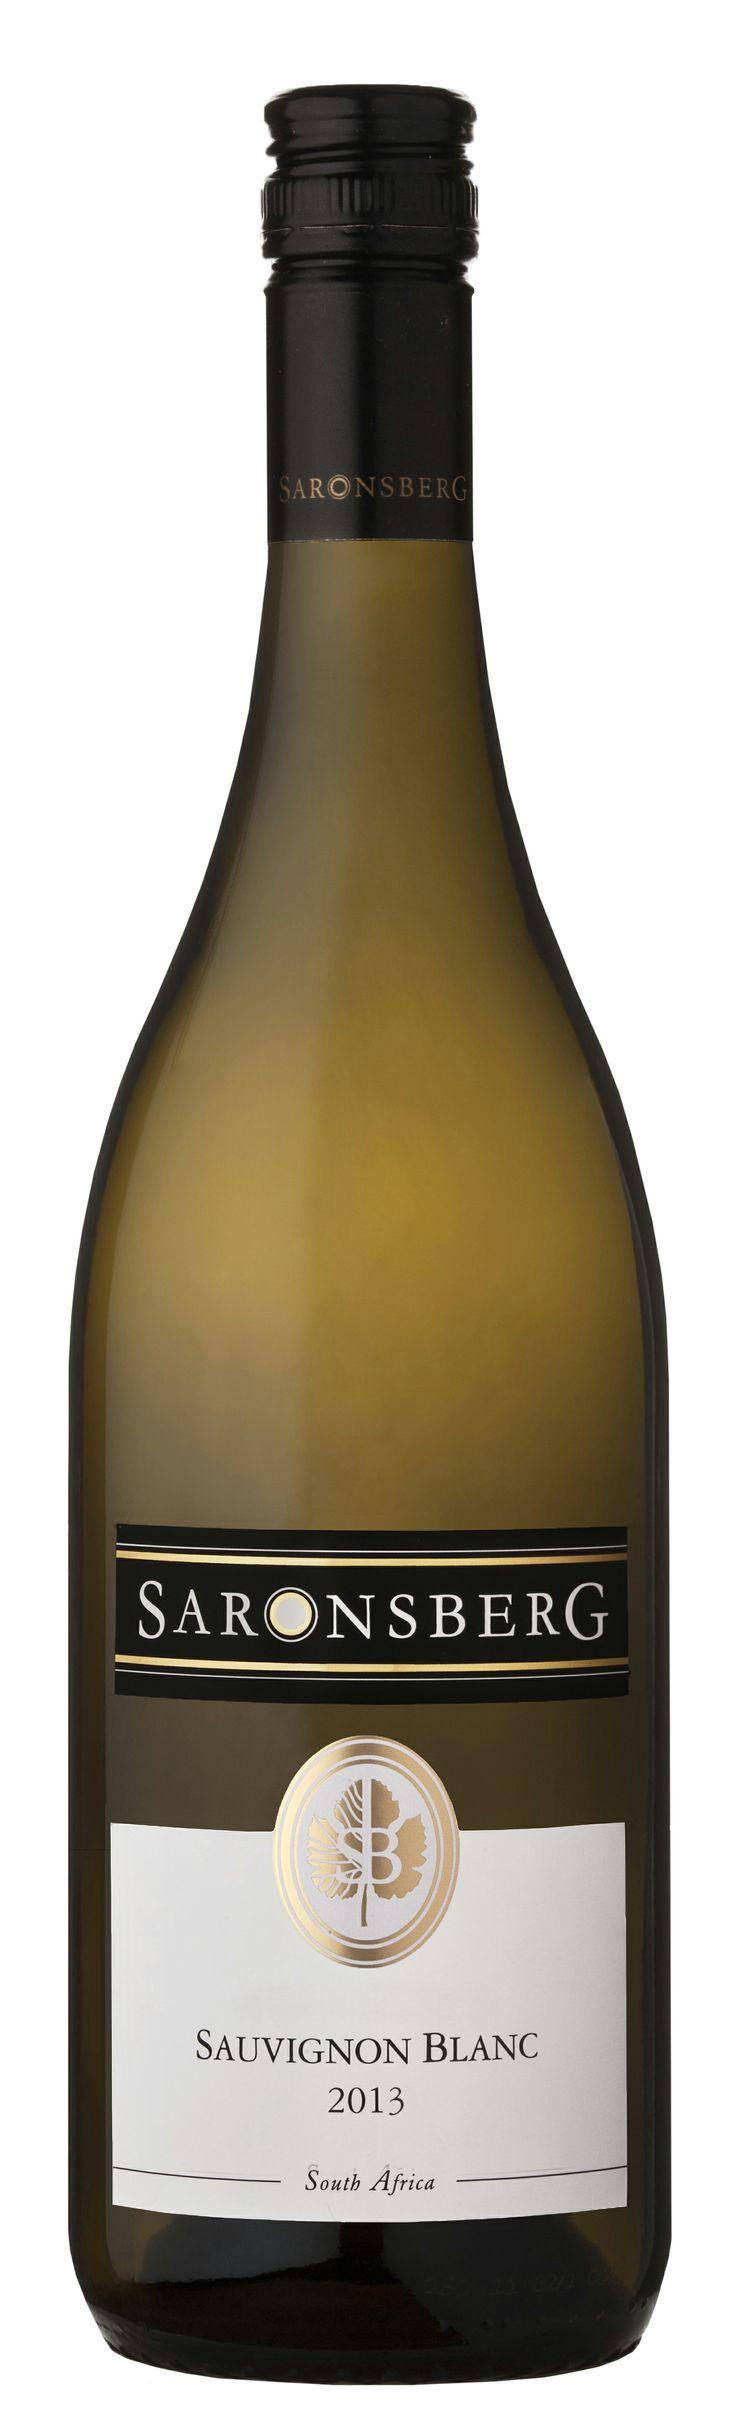 happy international #SauvignonBlancDay - We love you dear Sauvignon Blanc